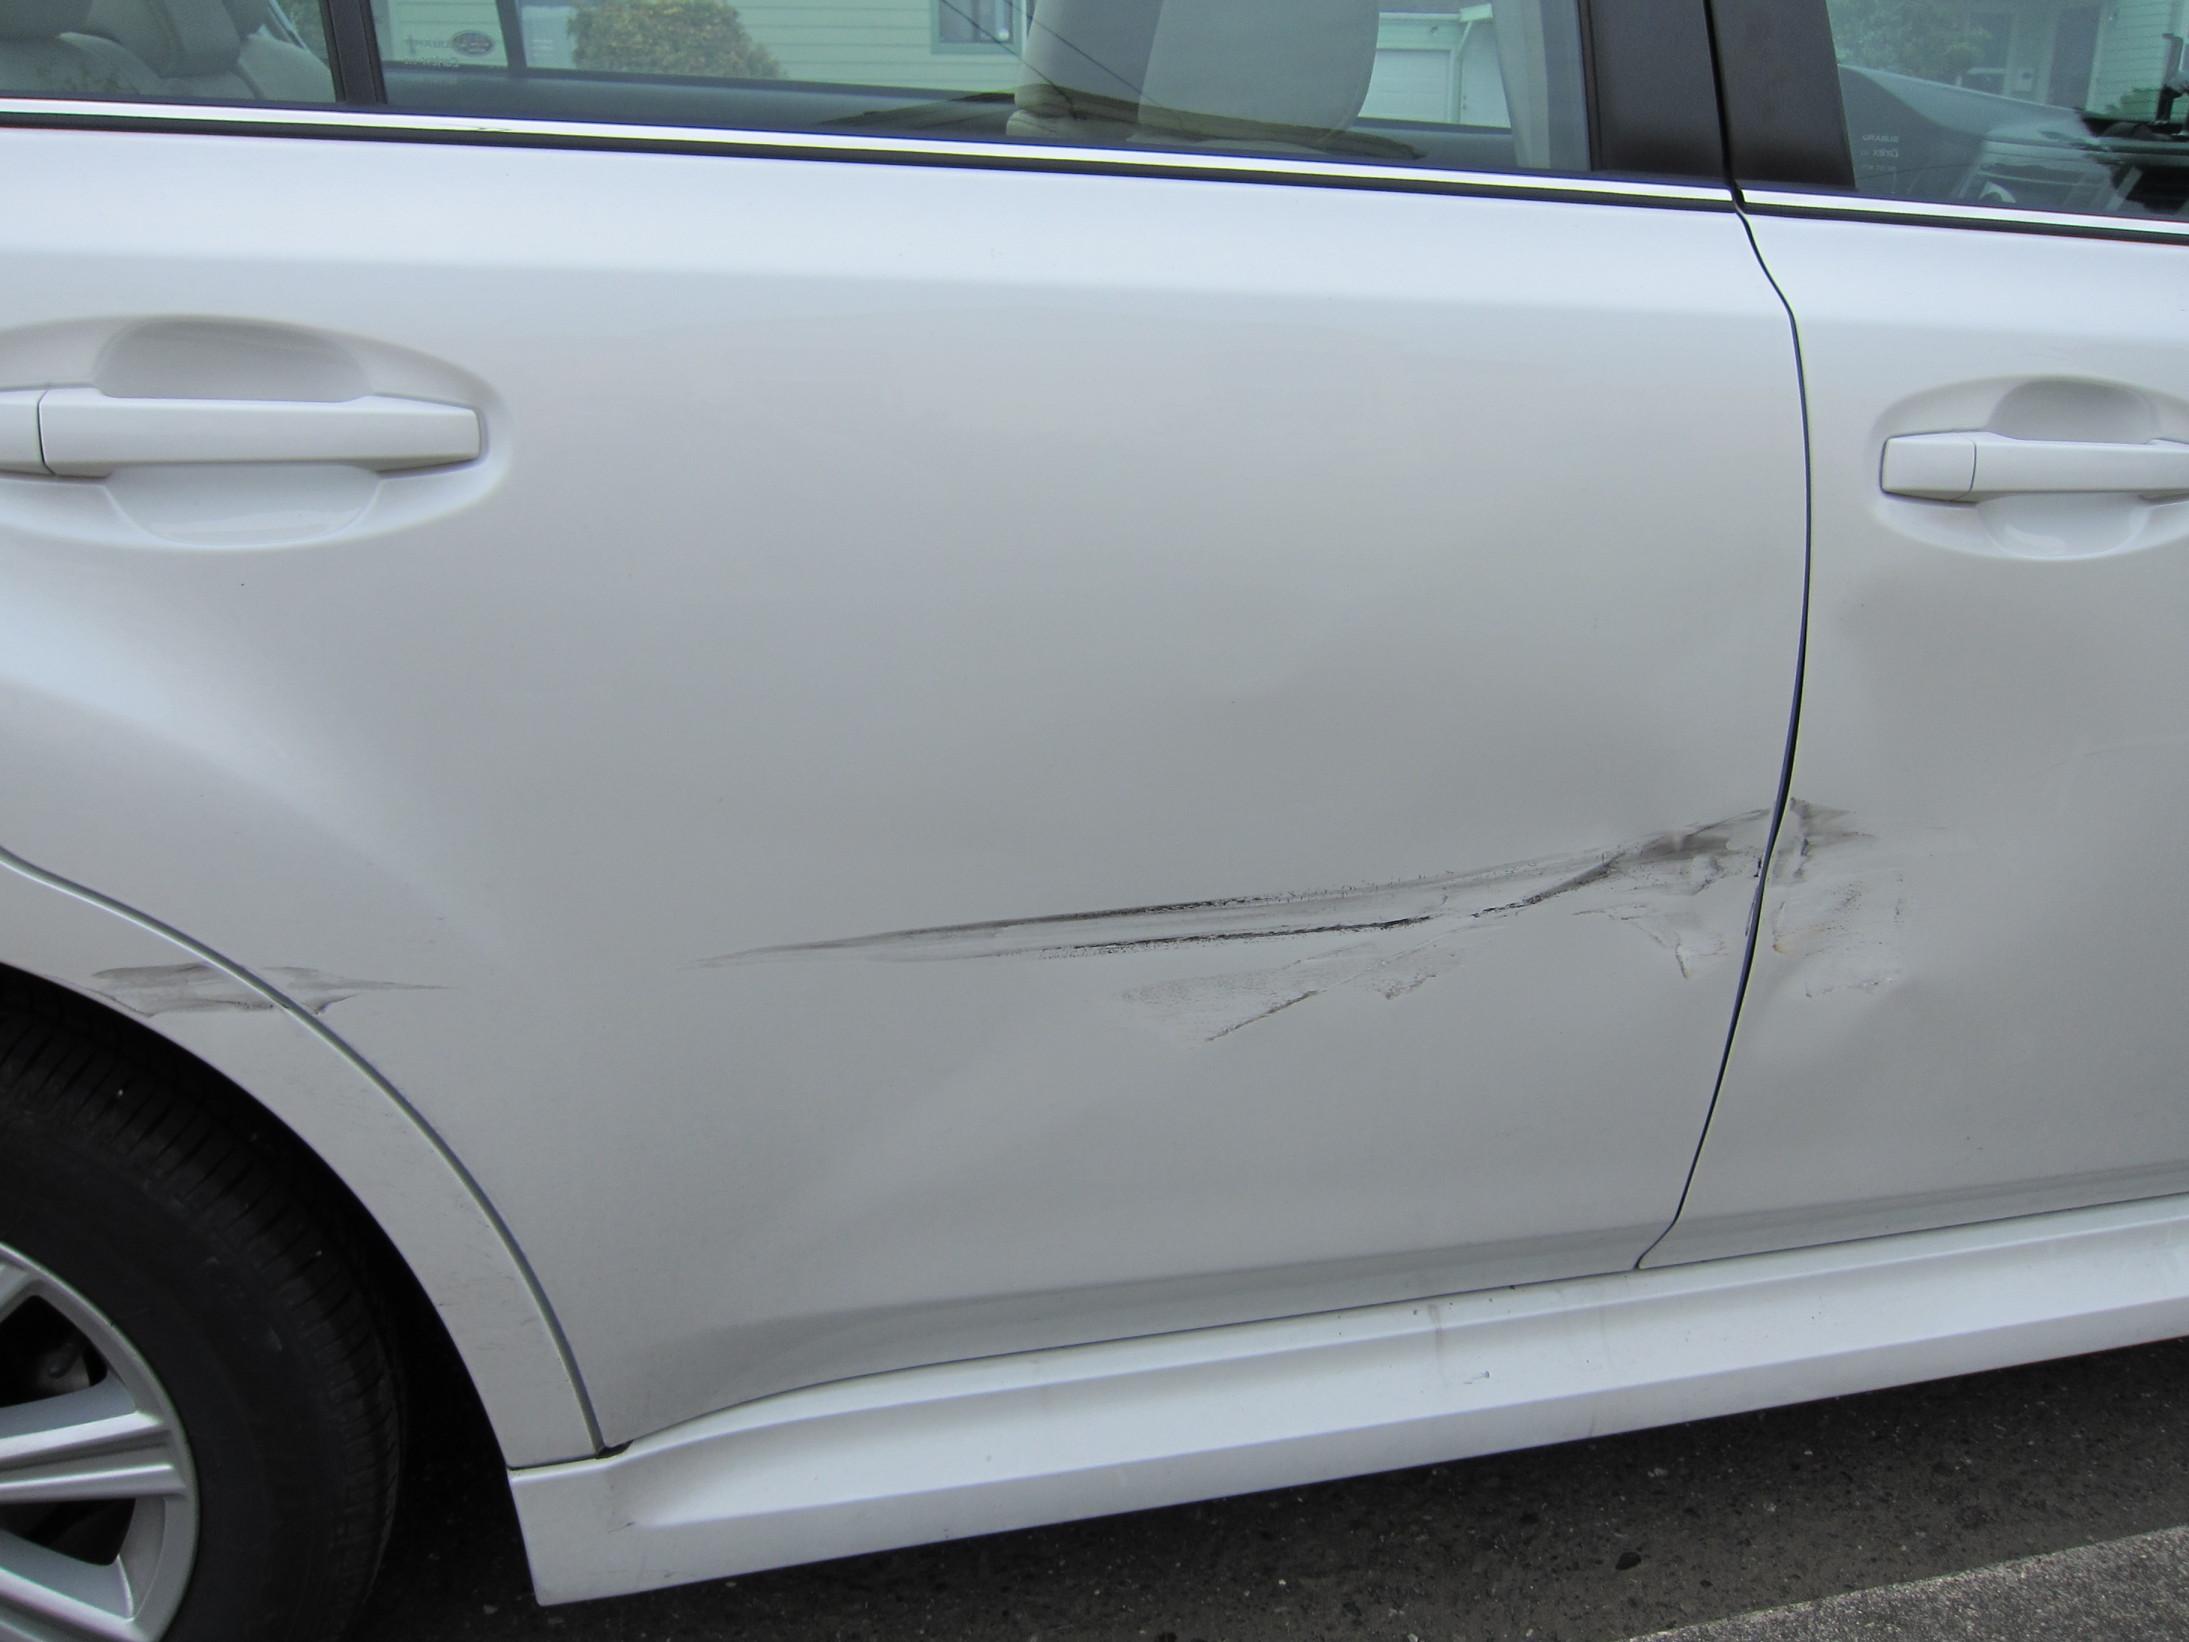 fender bender doors will need repair any tips subaru